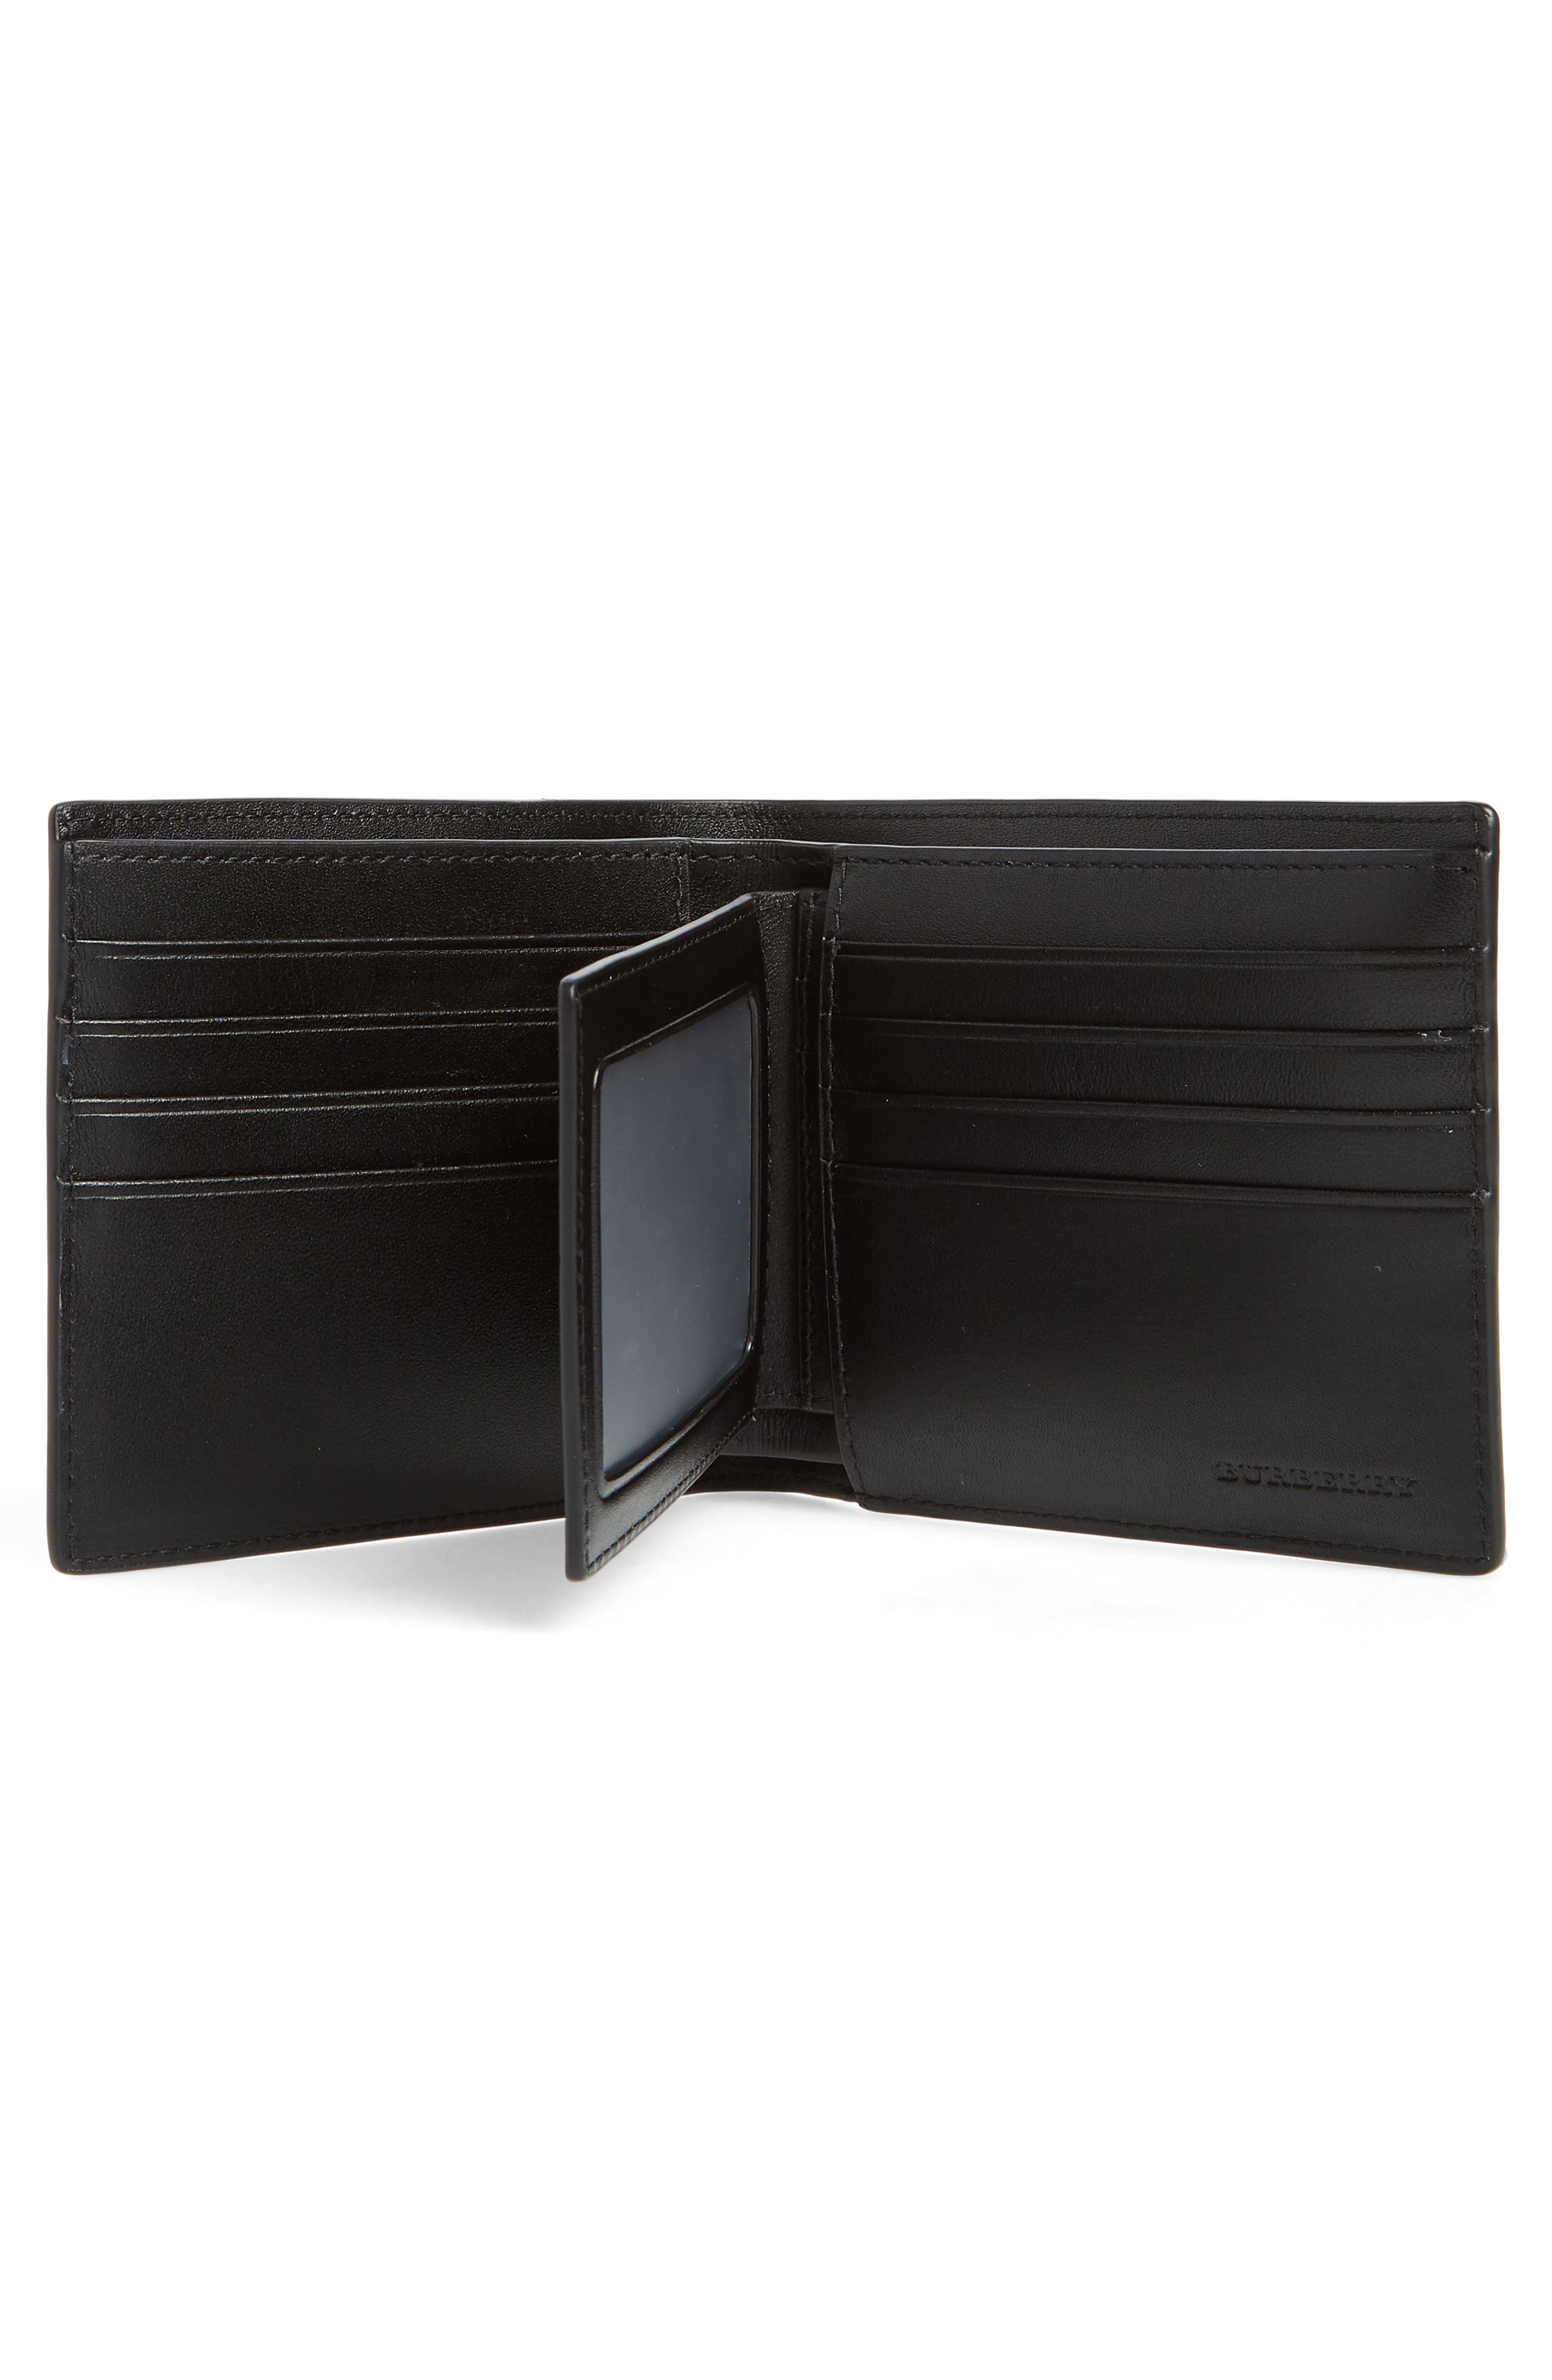 Ronan Check Billfold Wallet,                             Alternate thumbnail 2, color,                             Navy/ Black